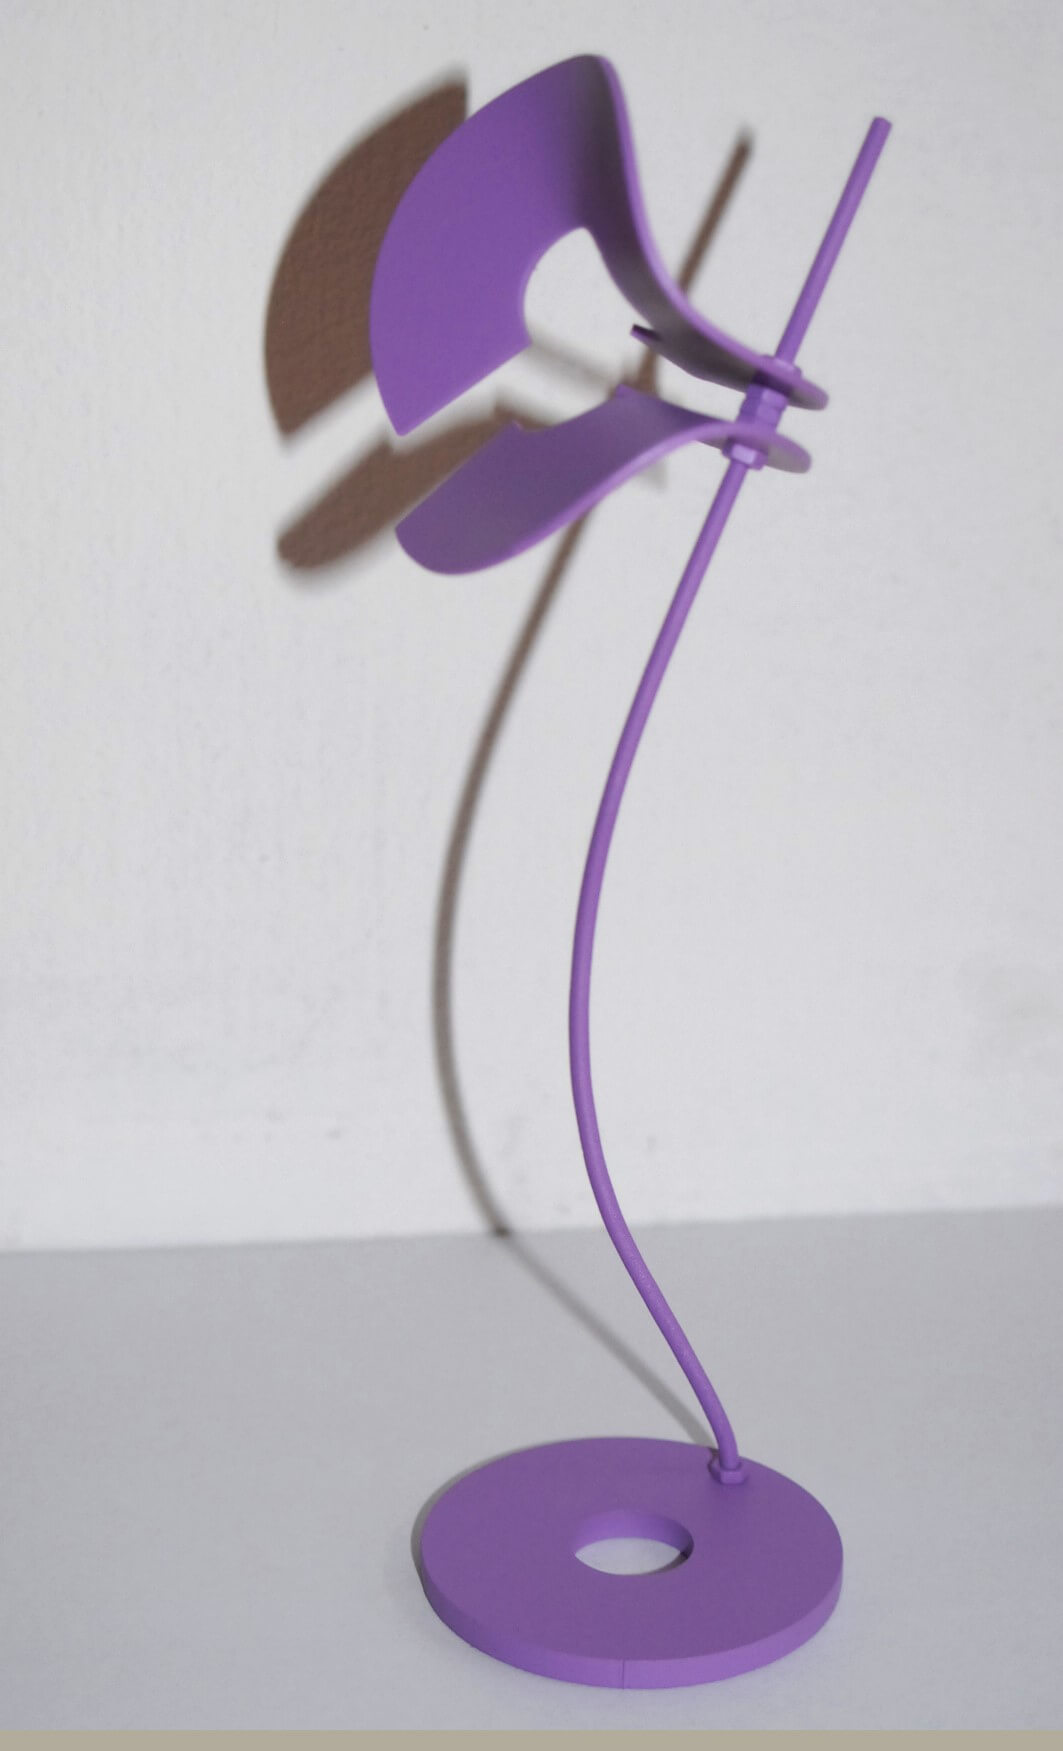 kicsi lila